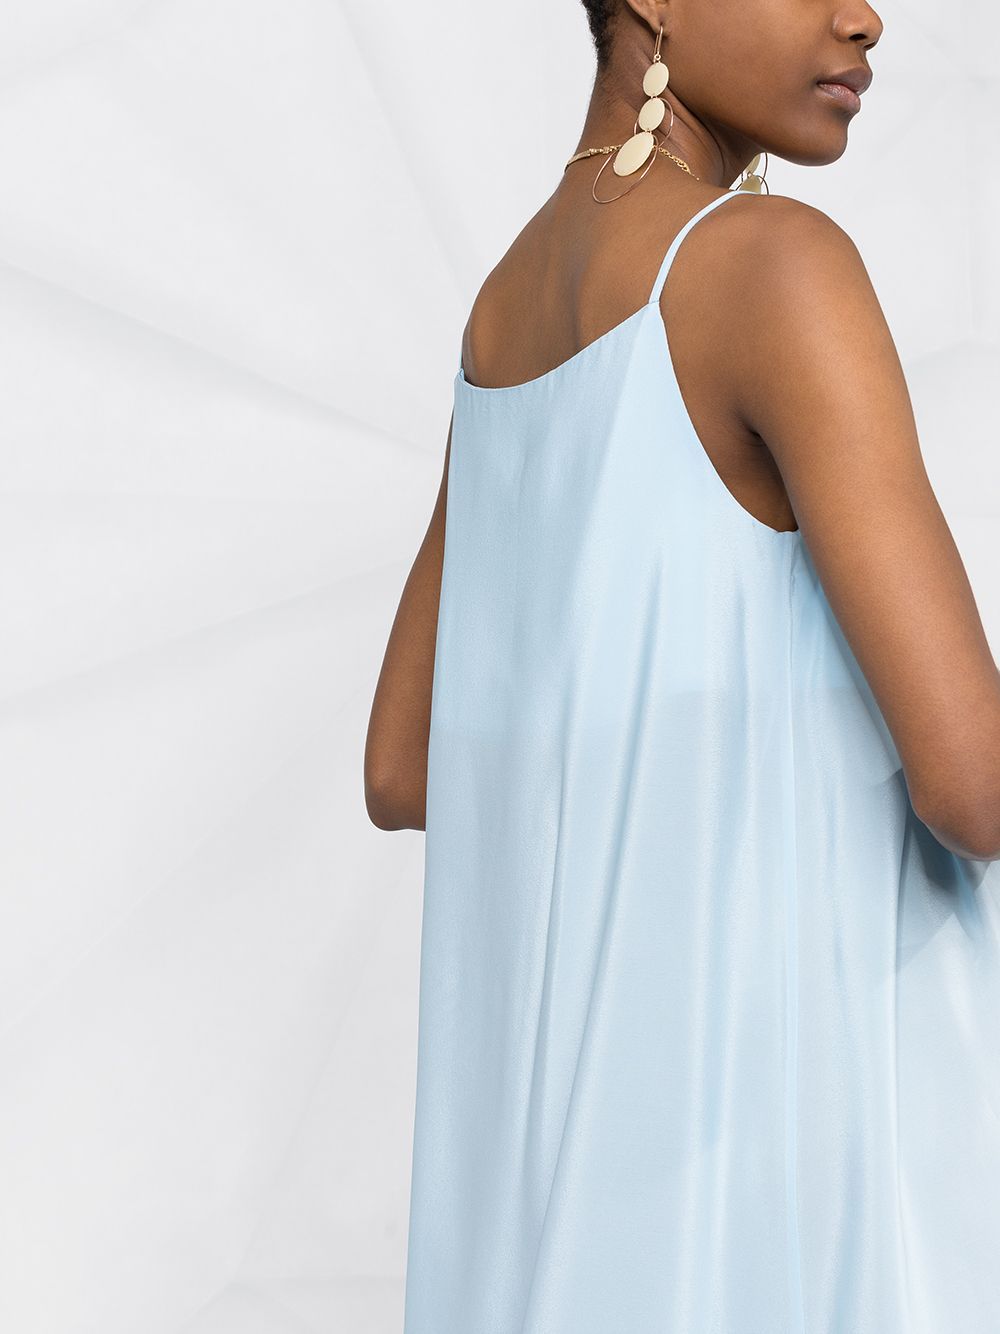 FEDERICA TOSI | Dress | FTE21AB095.0SE00130359